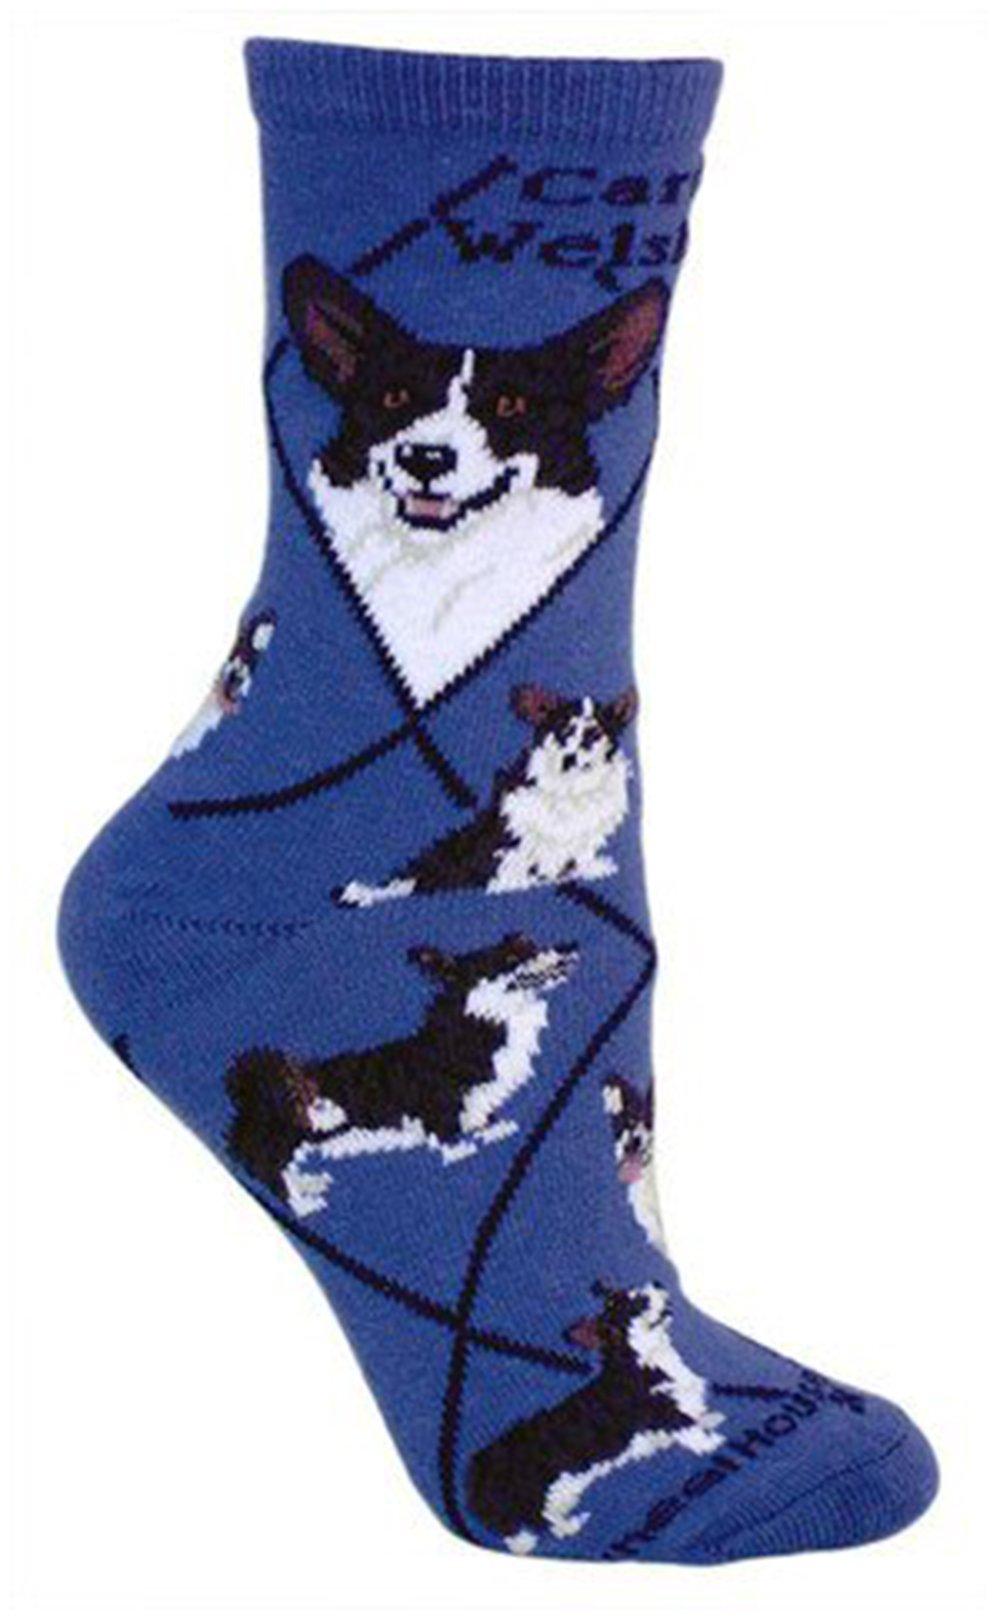 Cardigan Welsh Corgi Animal Socks On Blue 9-11